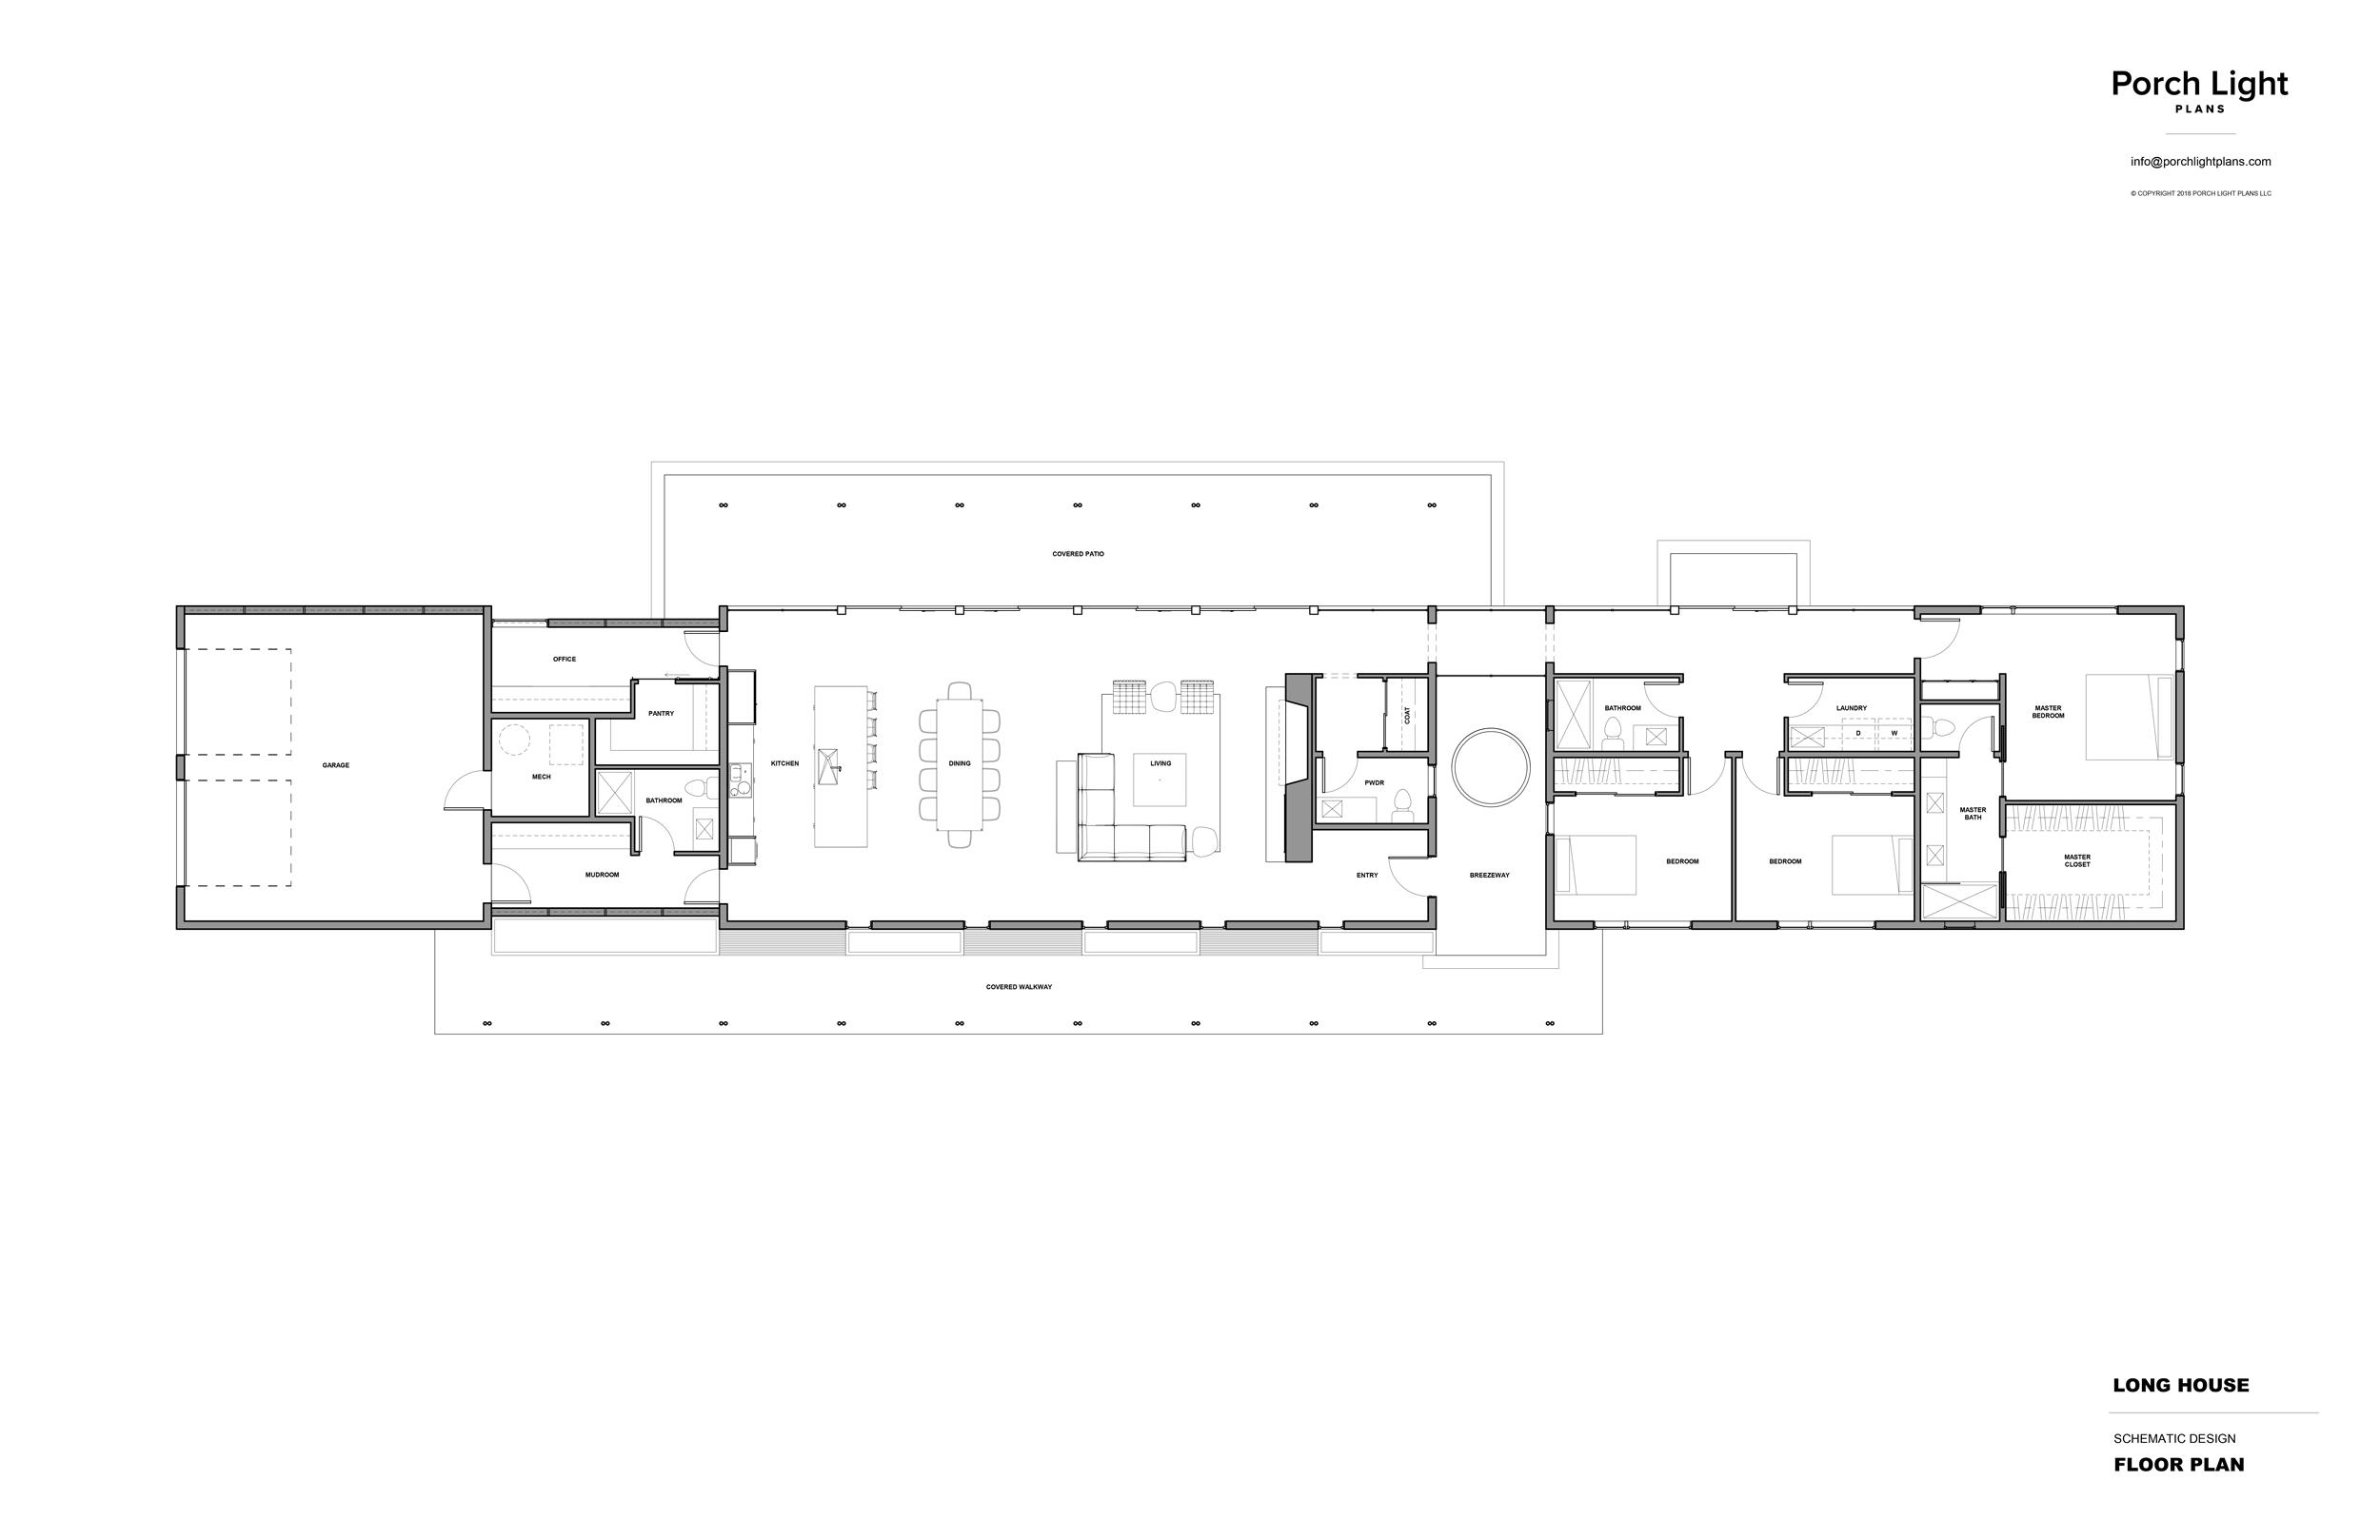 long-house-plan.png